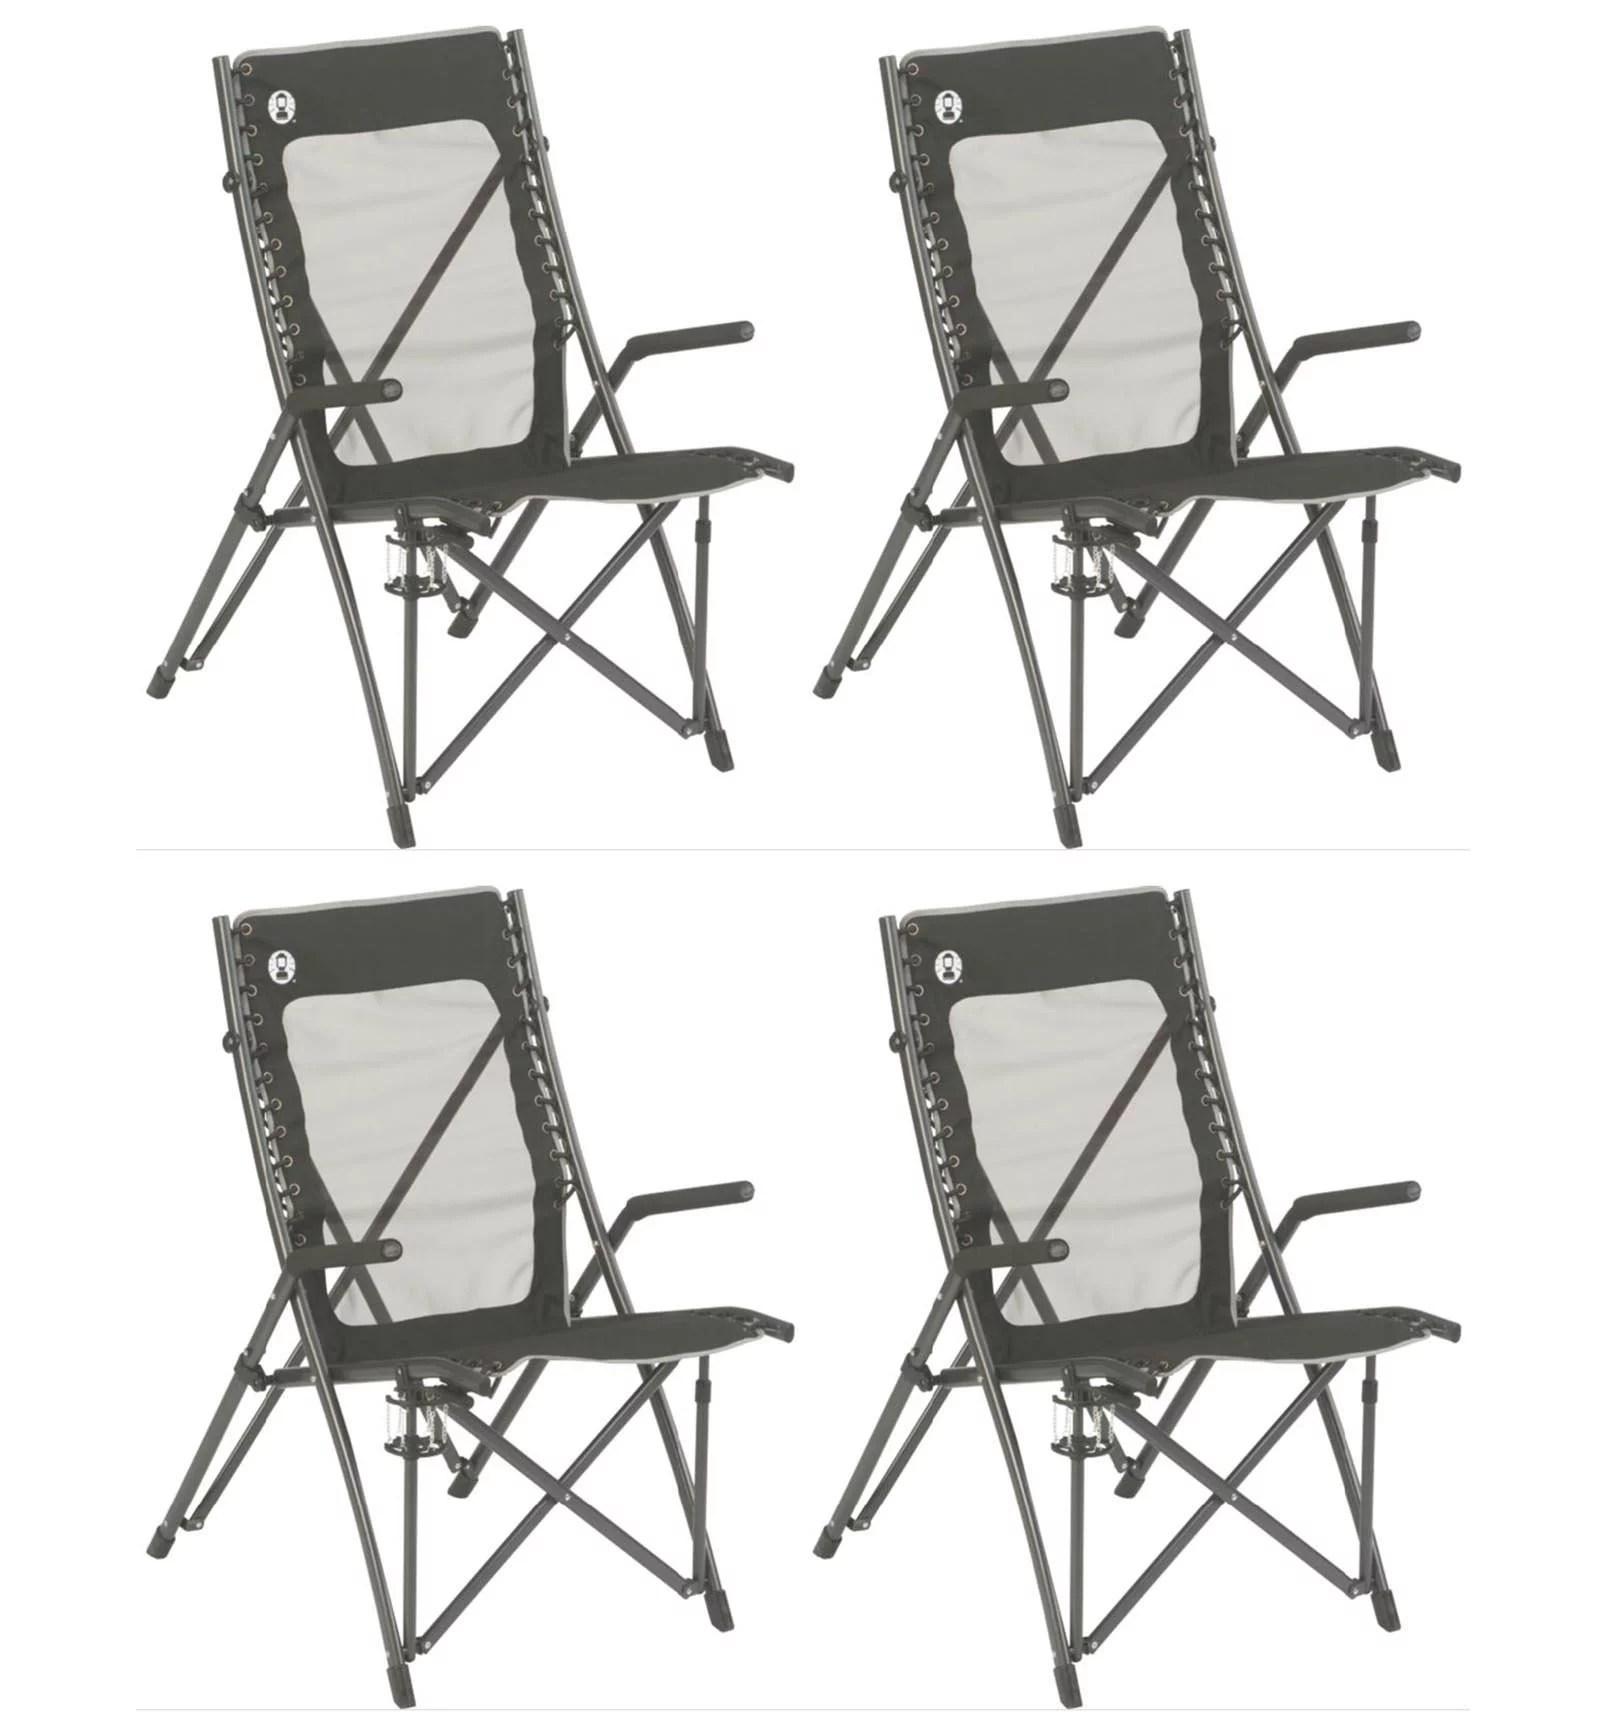 coleman folding chairs foldable floor chair singapore 4 comfortsmart suspension camping w mesh back bag walmart com